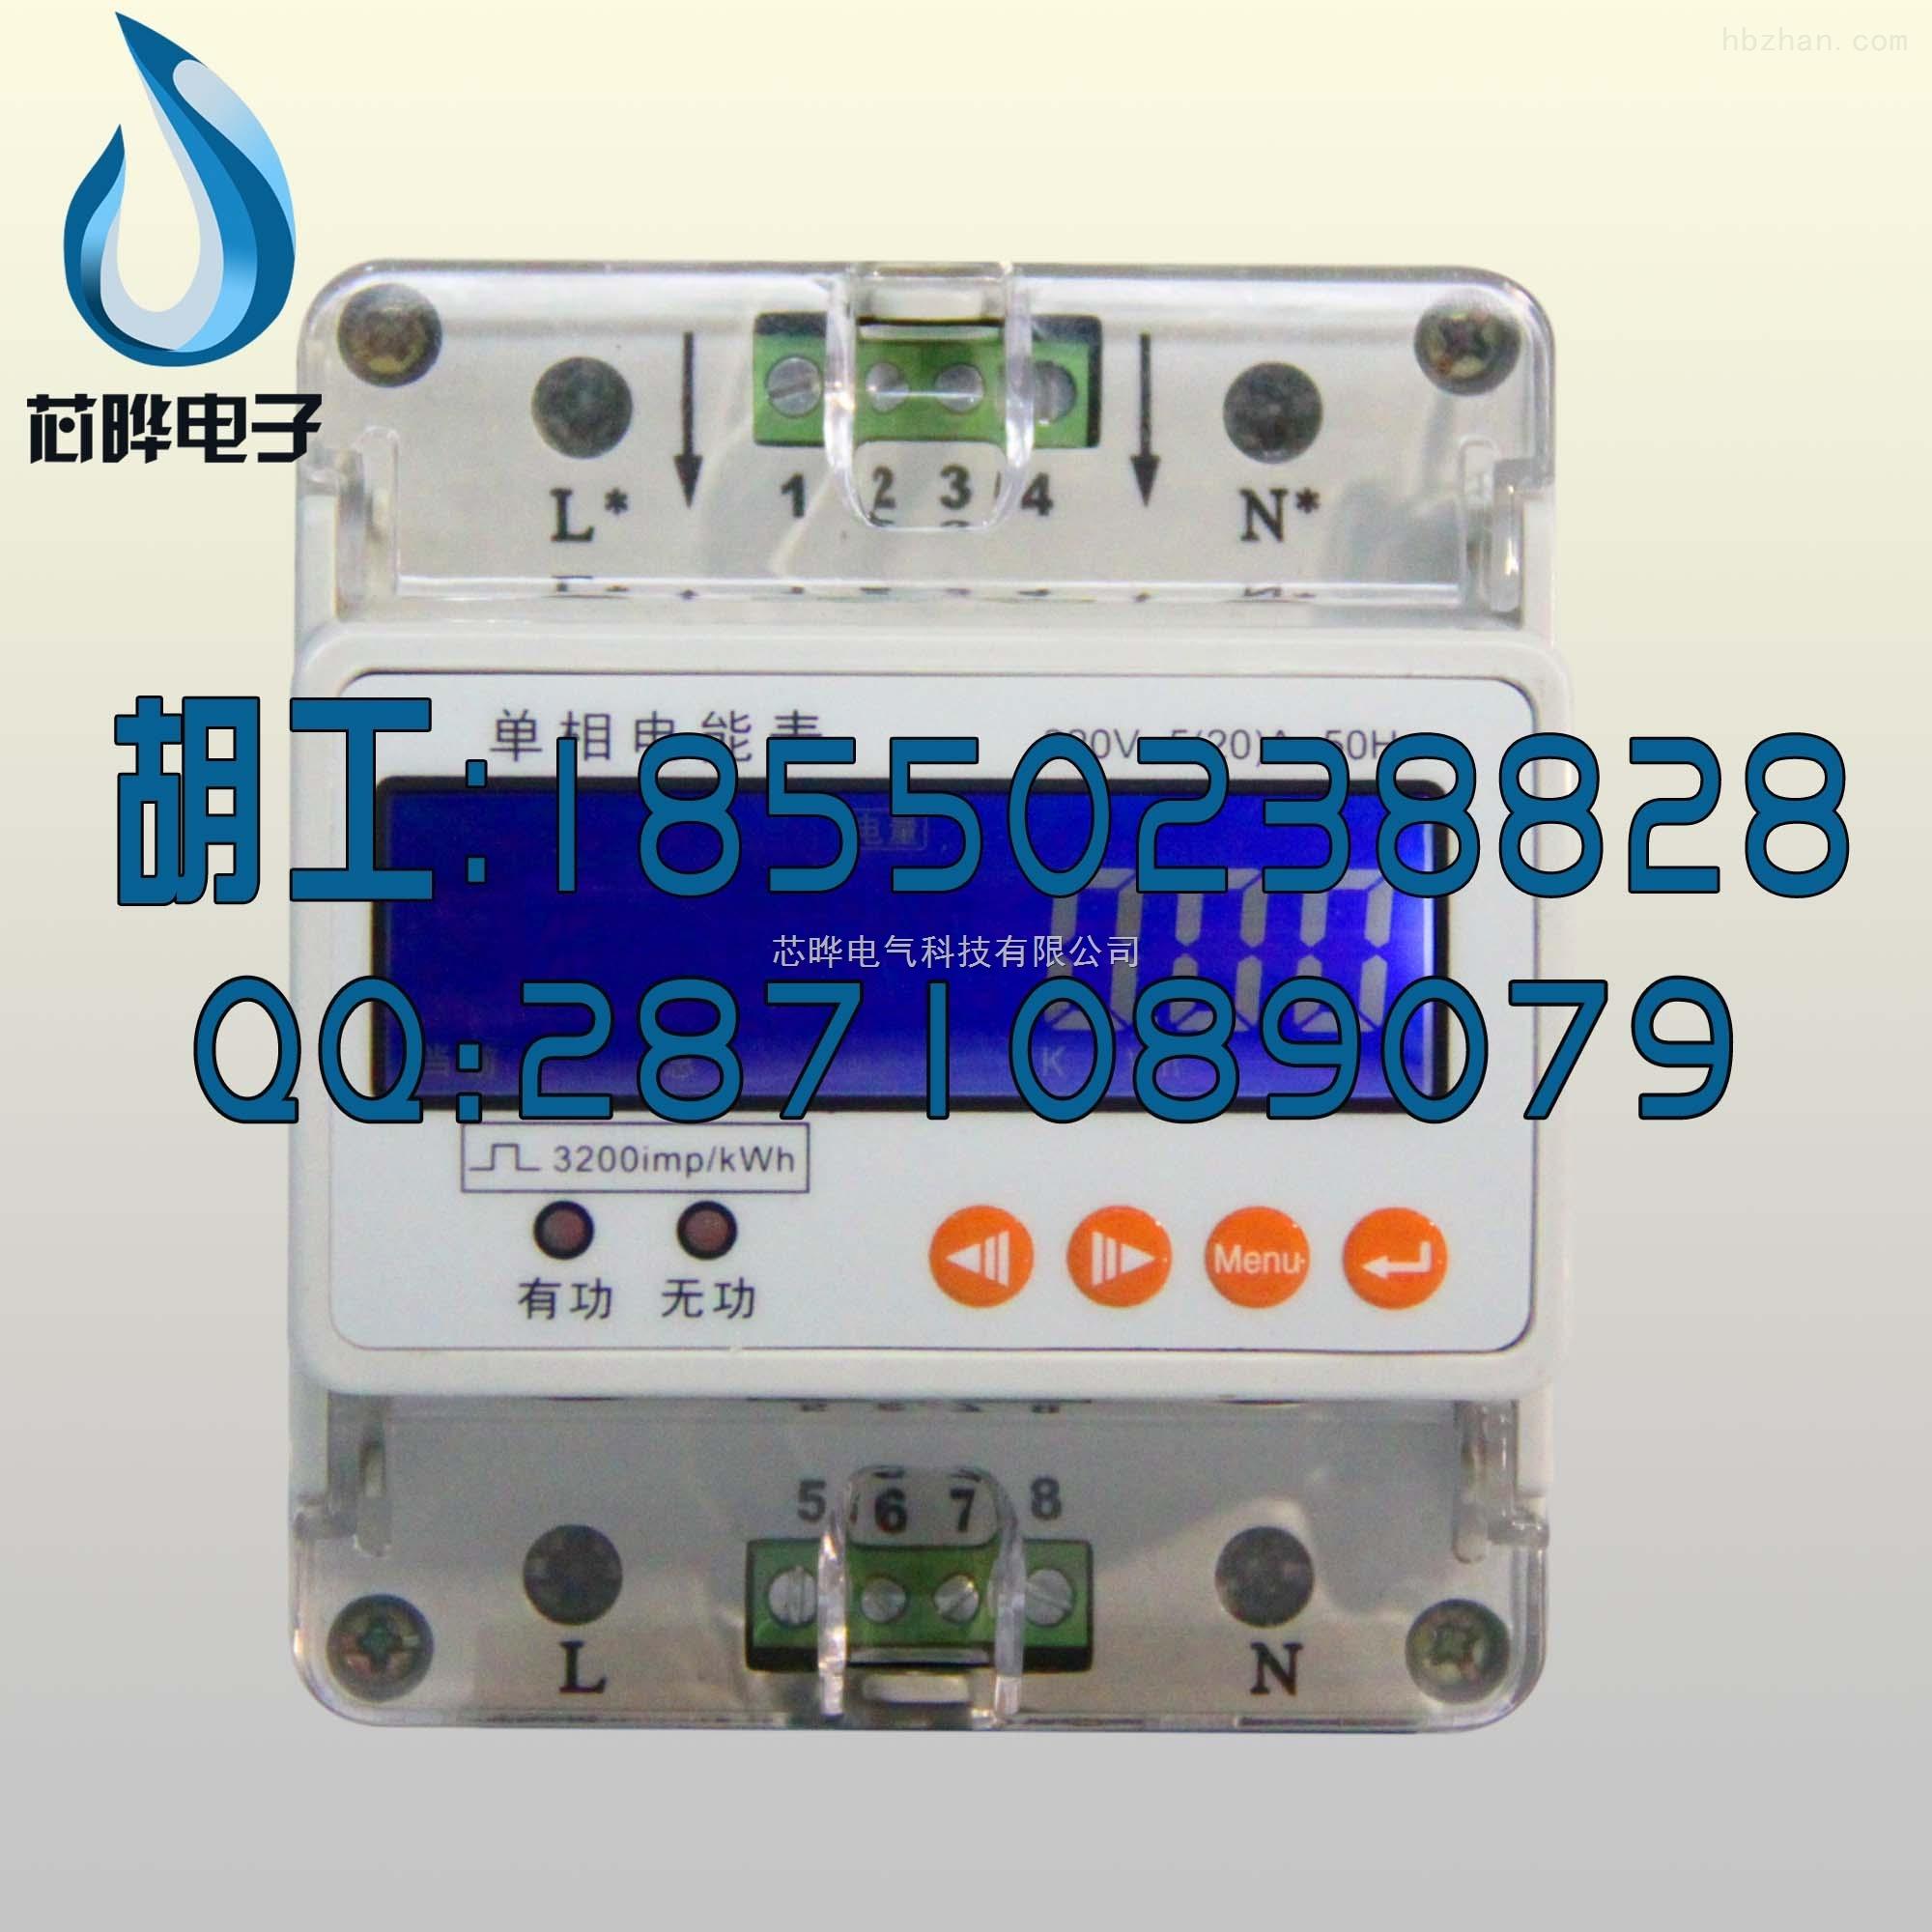 pdm-801dp-ds导轨安装电能表